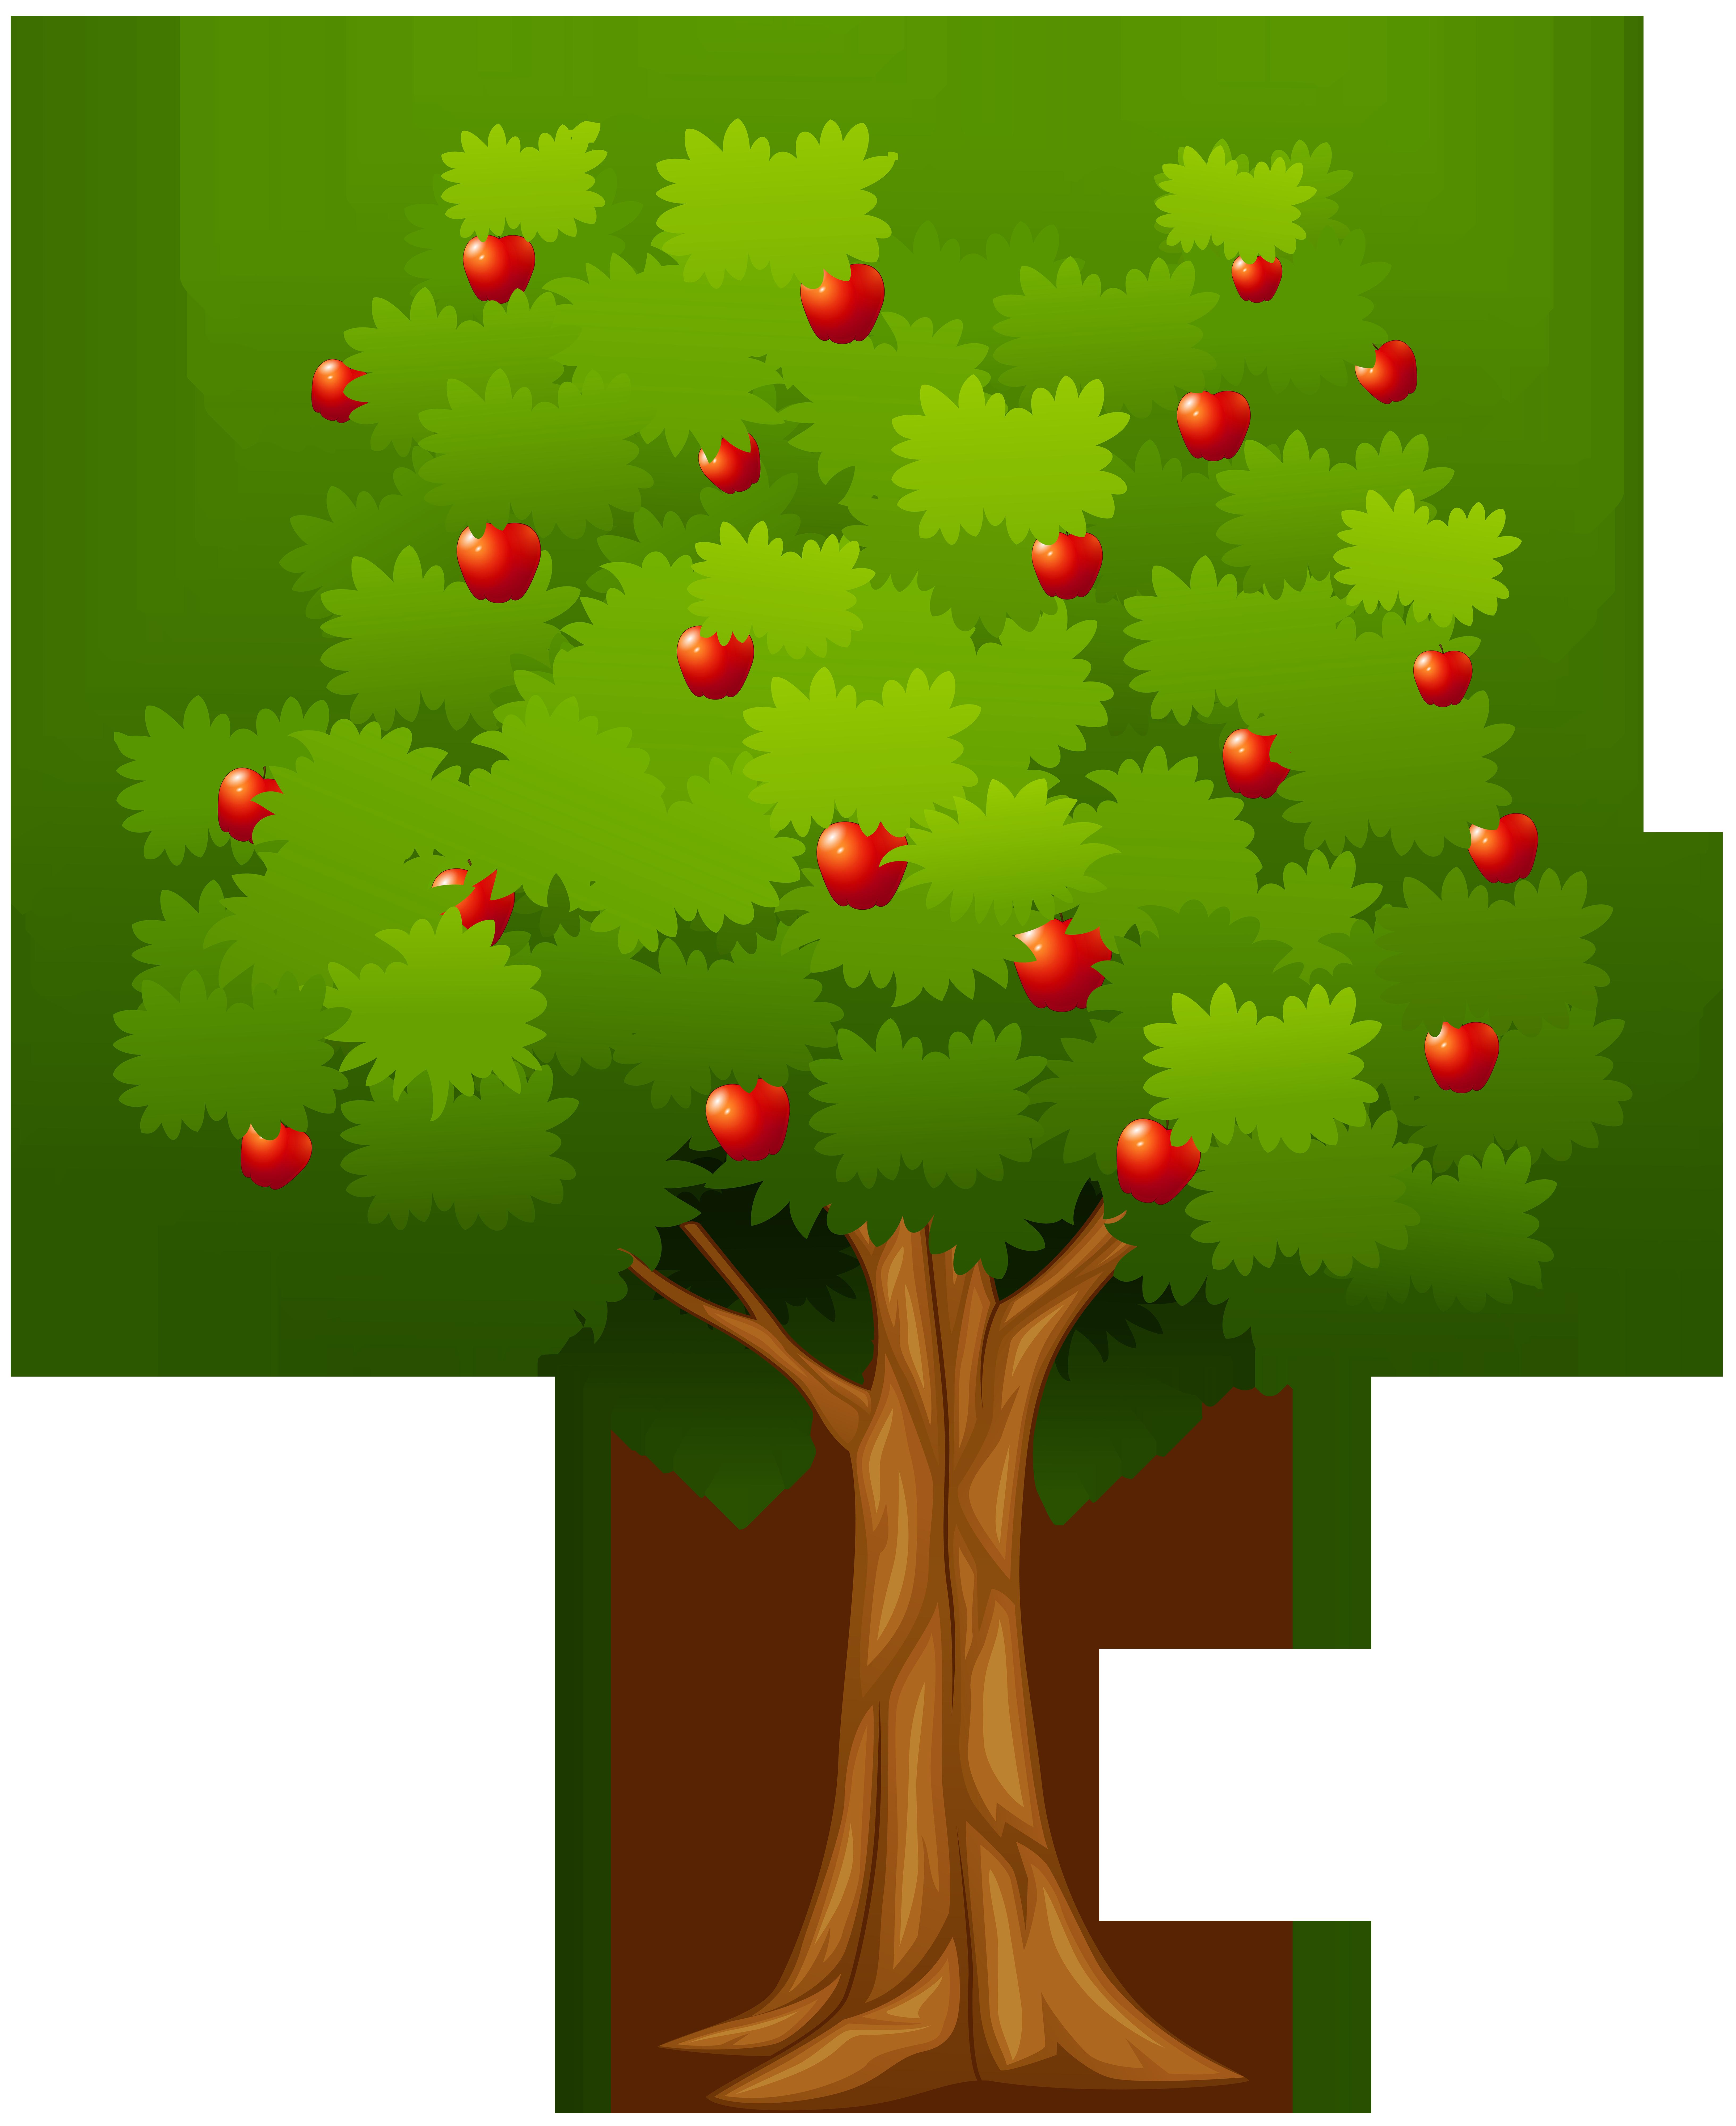 Fruit Bearing Trees Clipart - Tree With One Apple Cartoon , Transparent  Cartoon - Jing.fm